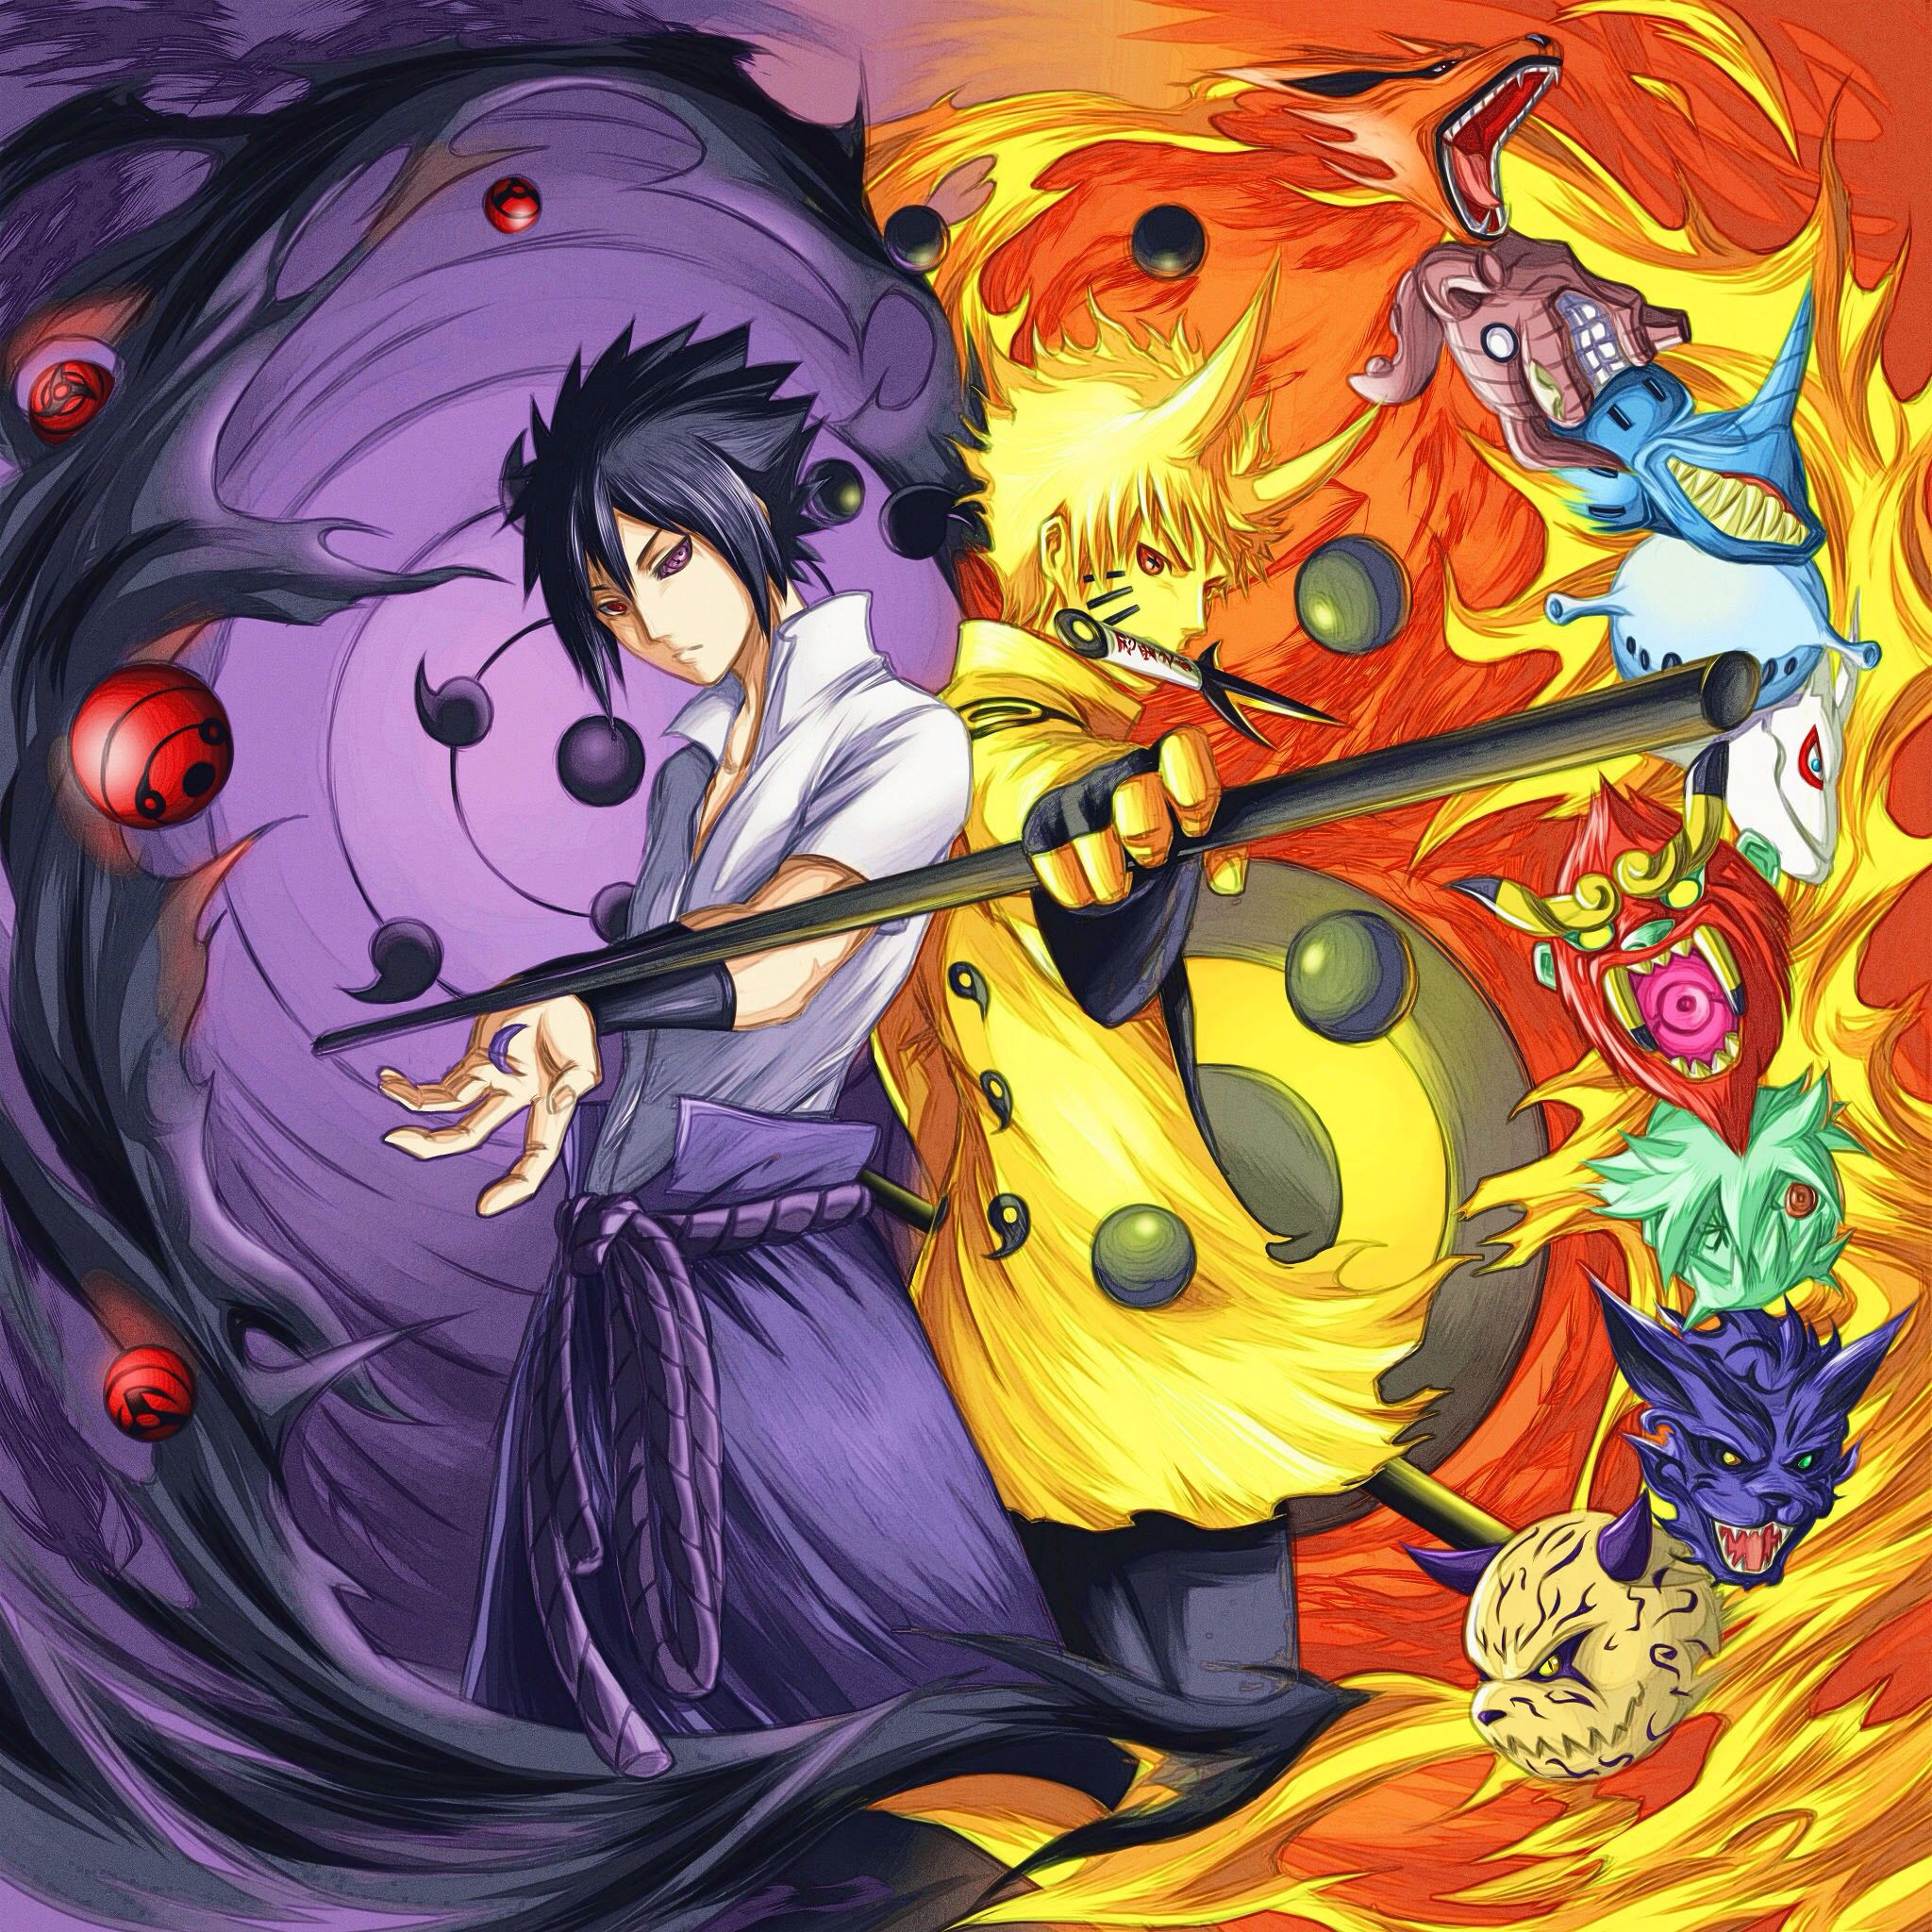 Wallpaper Keren 3d Anime Naruto gambar ke 18